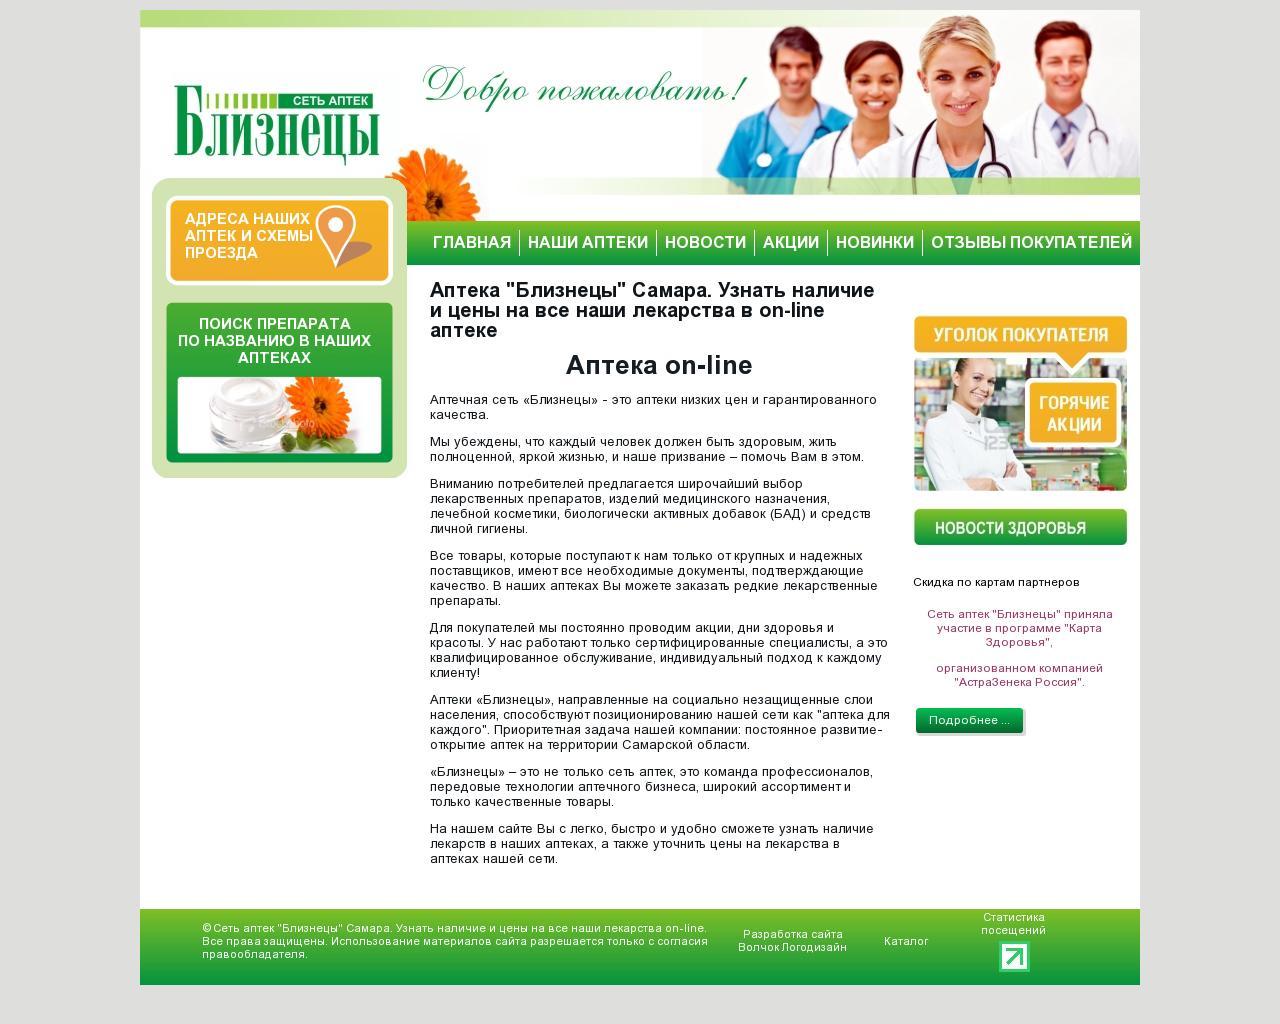 apteki-moskvi-nalichie-lekarstv-tseni